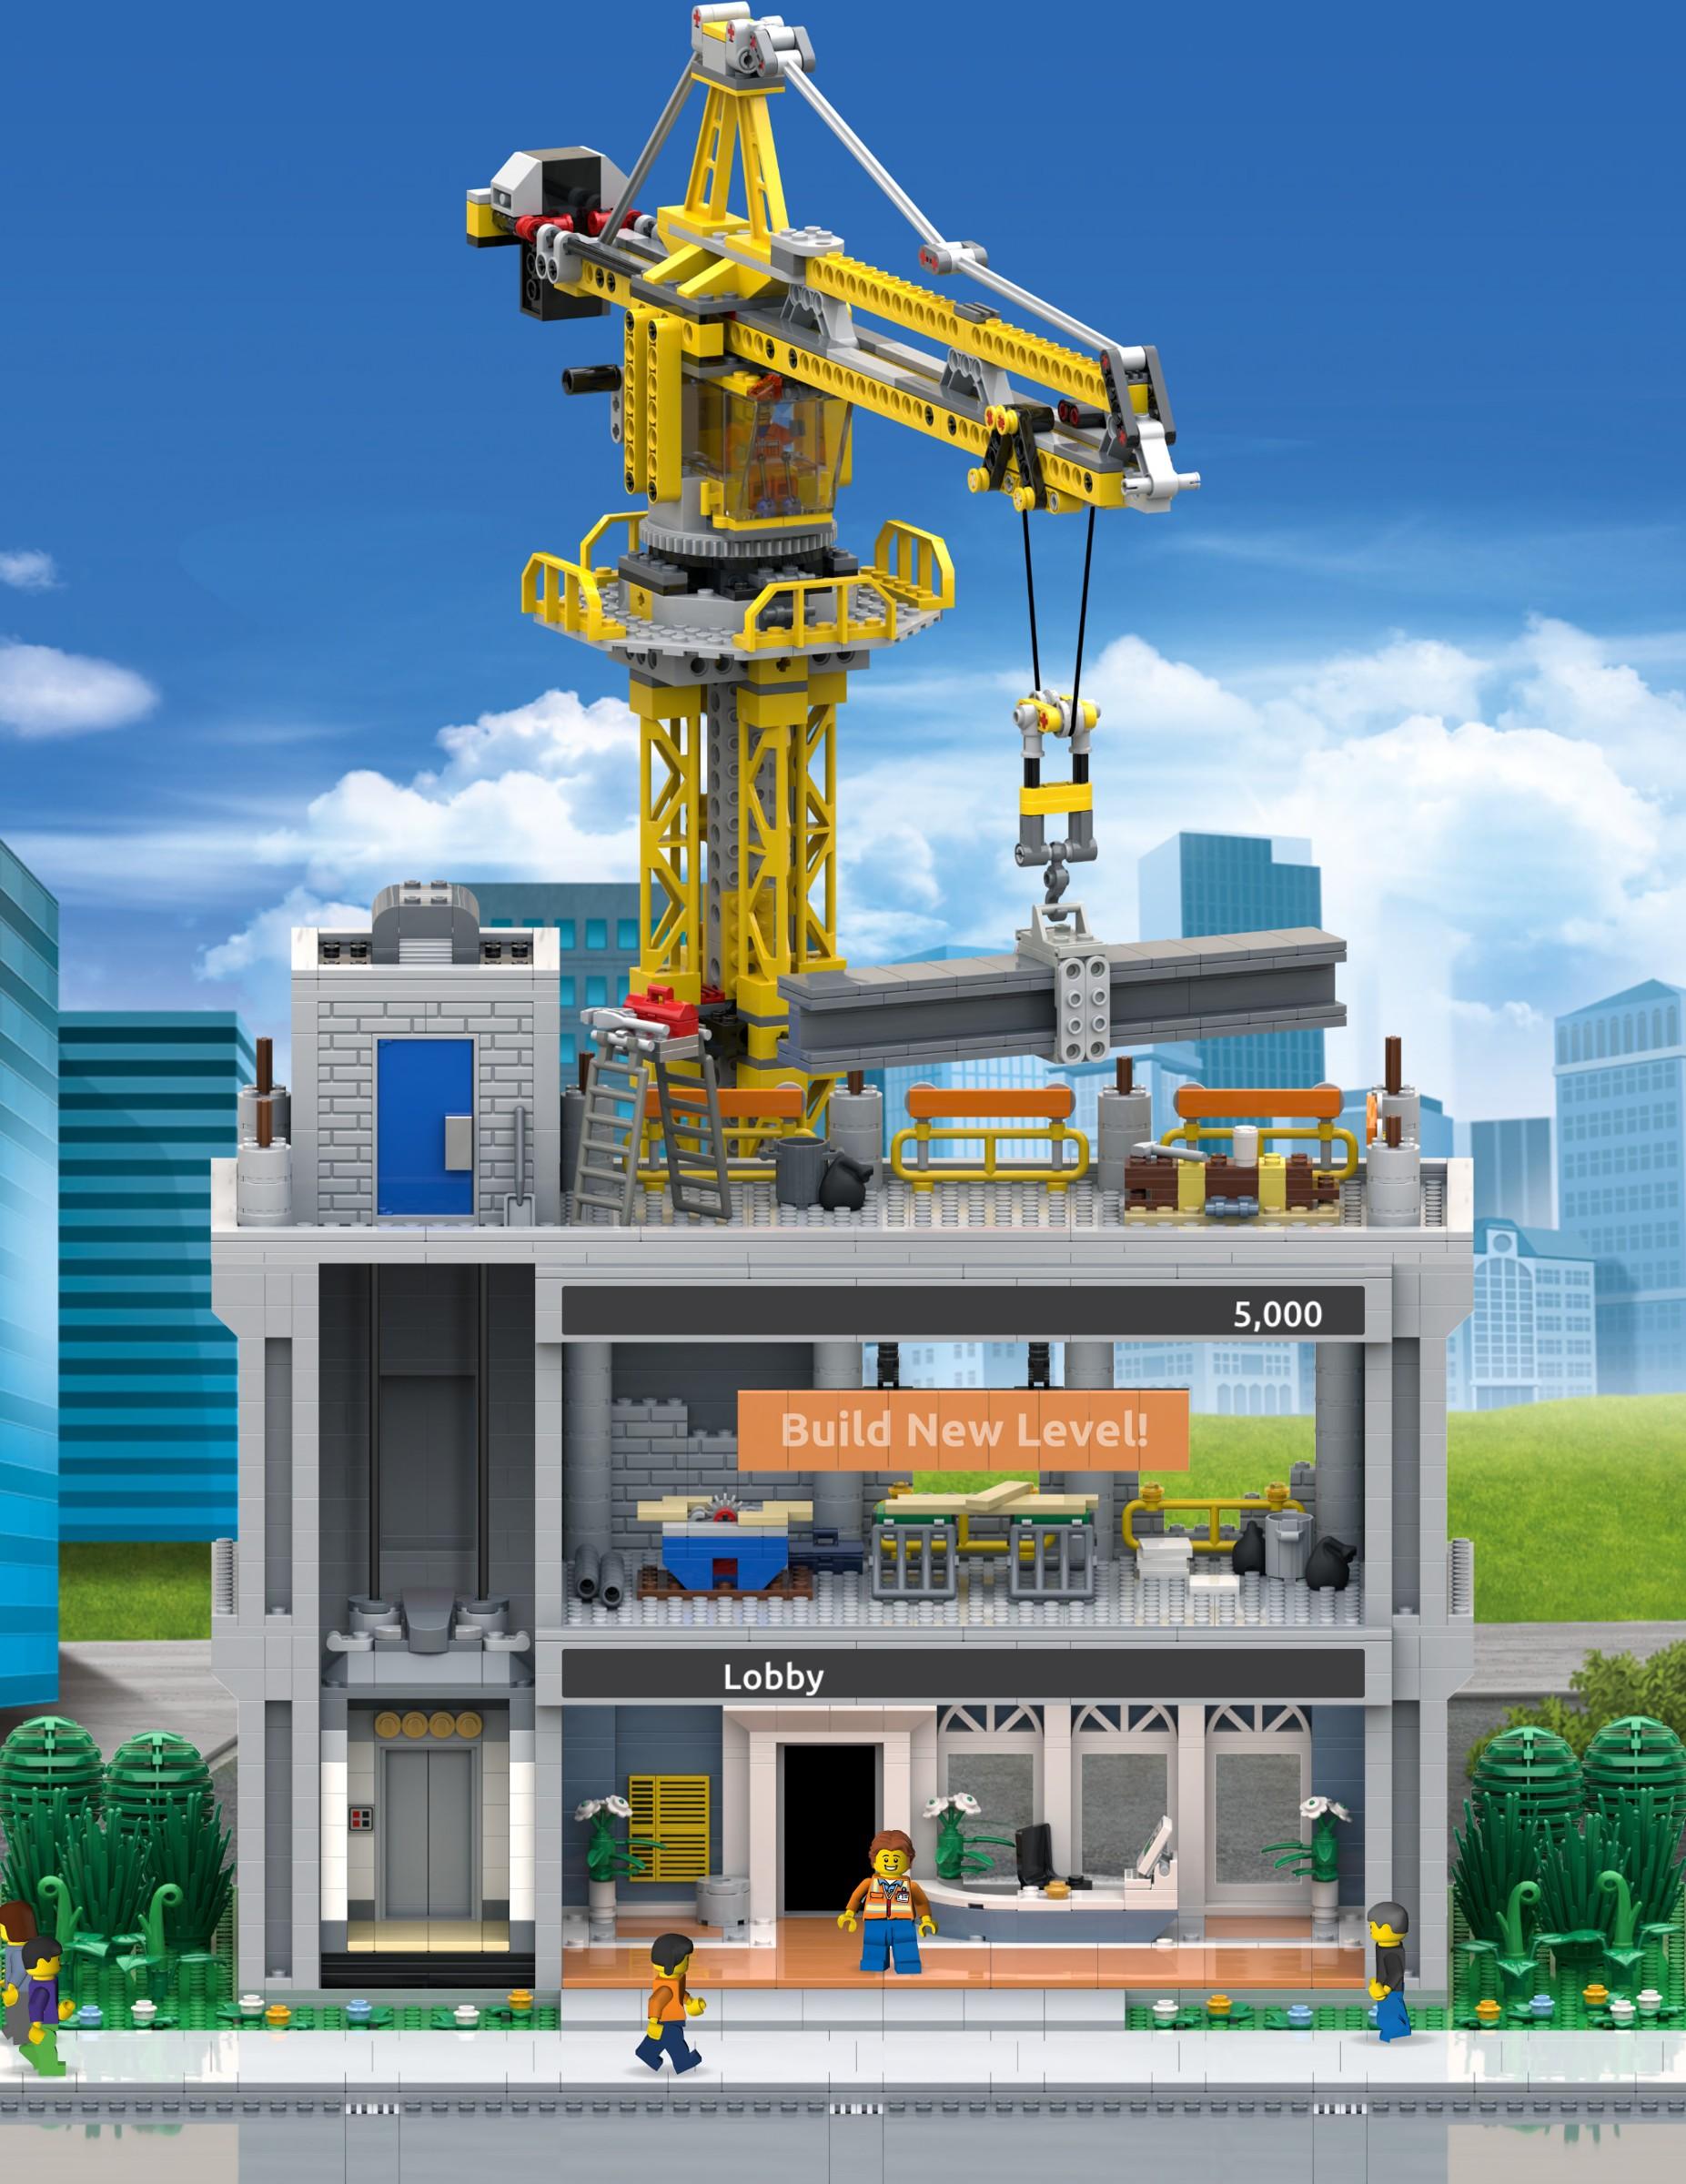 LEGO Tower mobile game announced   Brickset: LEGO set guide